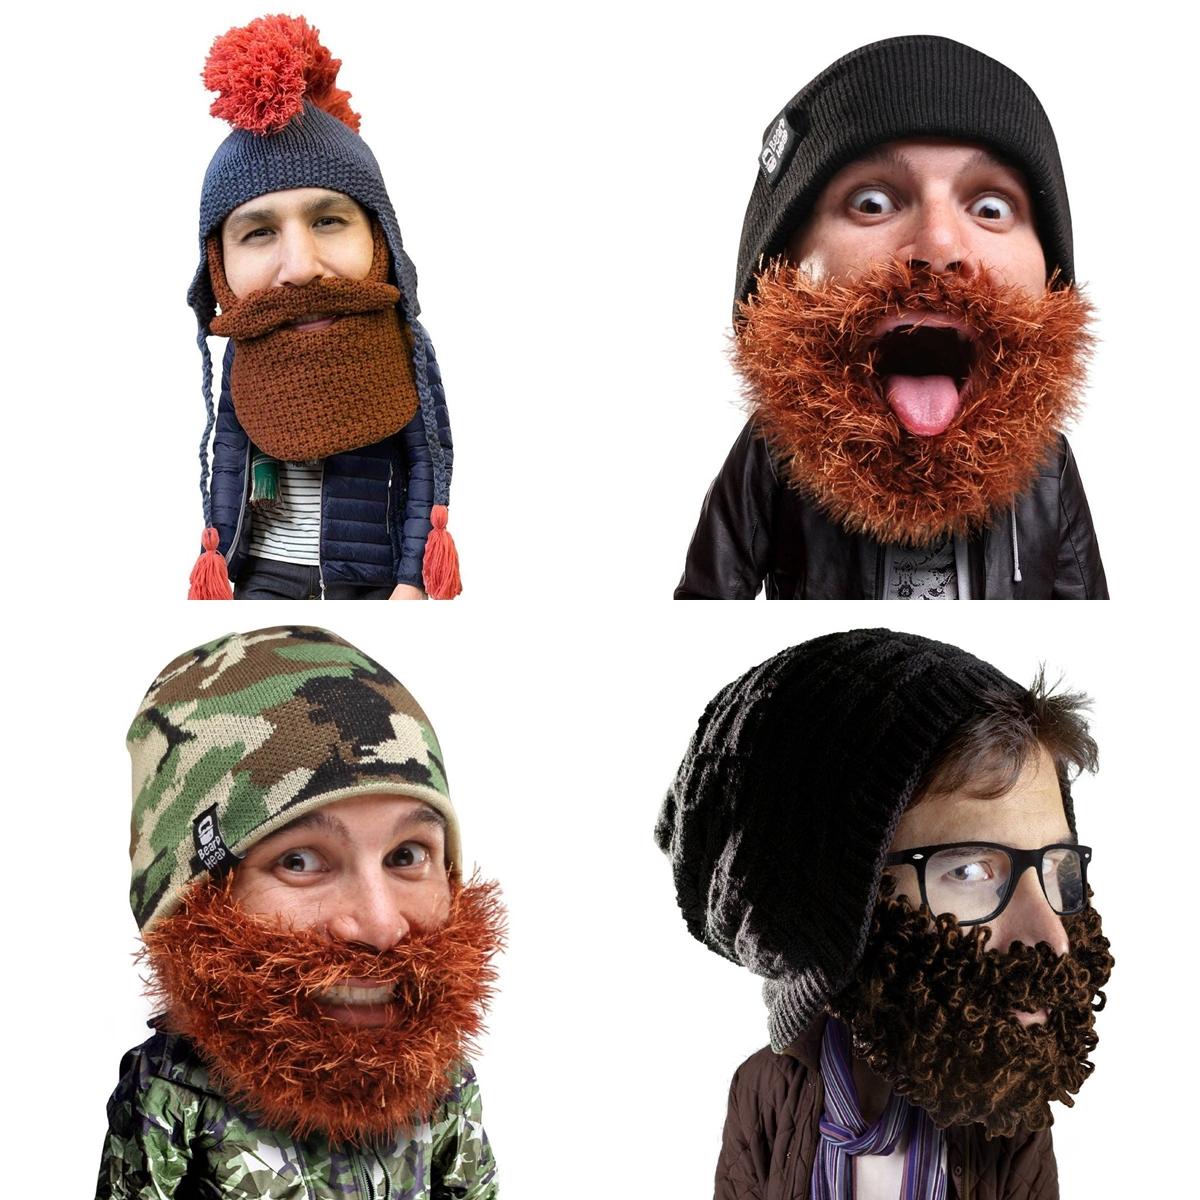 9 Beard Head Beard Beanies ニットキャップ & ひげマスク を HILOG の サバゲー装備 として買ってみた! 購入 開封 & レビュー